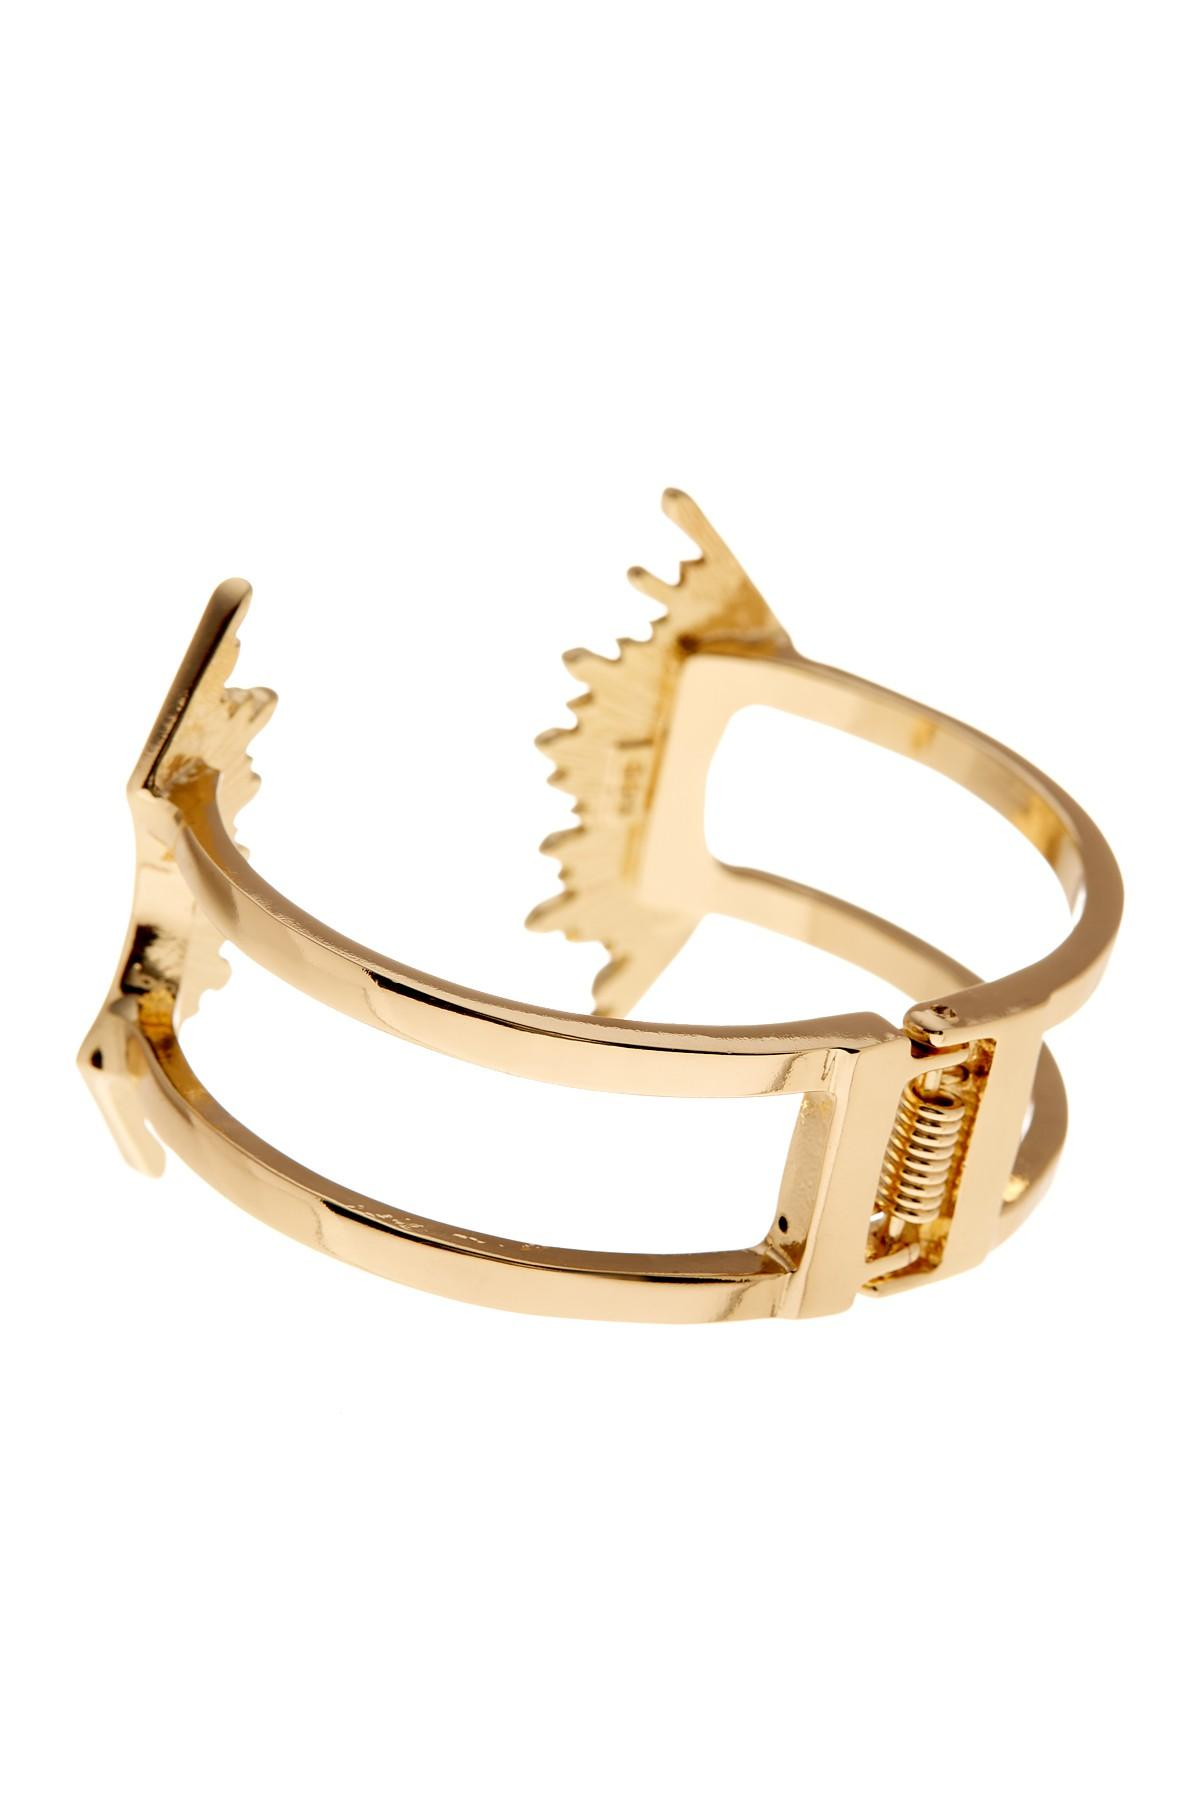 single women in sunburst Women's jewelry earrings bracelets this bali sunburst double flare tunnel plug is full of energy and good tribal sunburst surgical steel single flare plug.